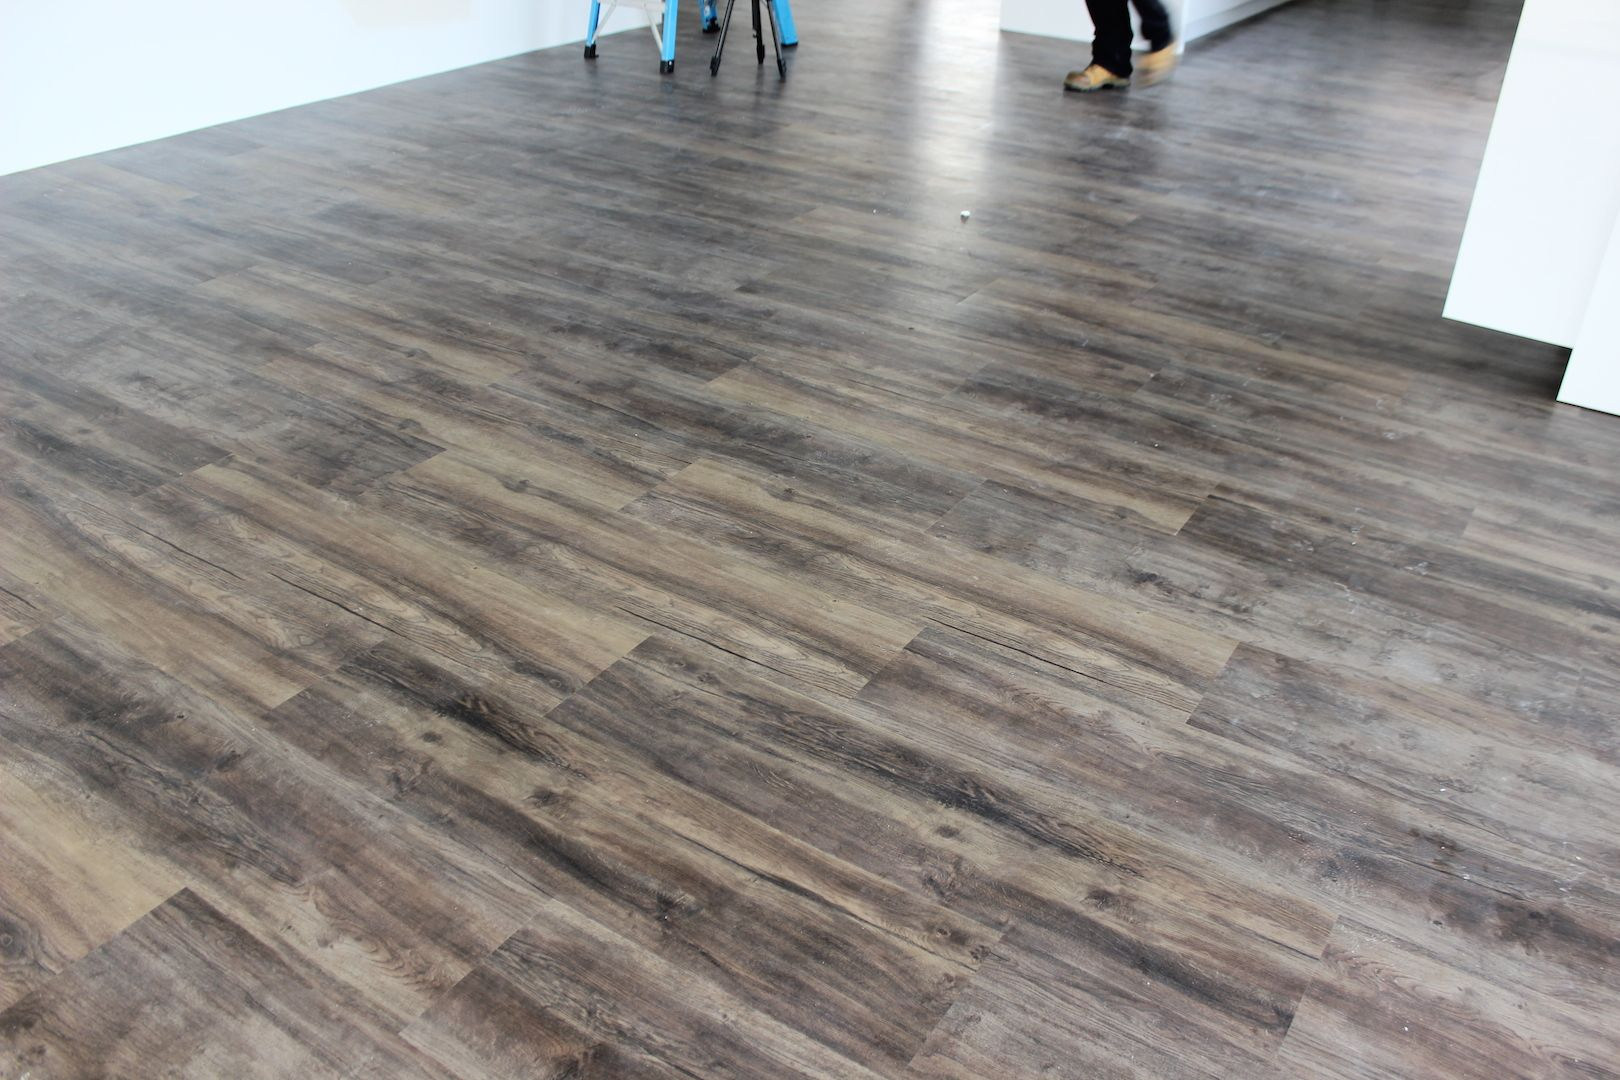 Evolved Luxury Floors Installation Karndean Looselay Hartford